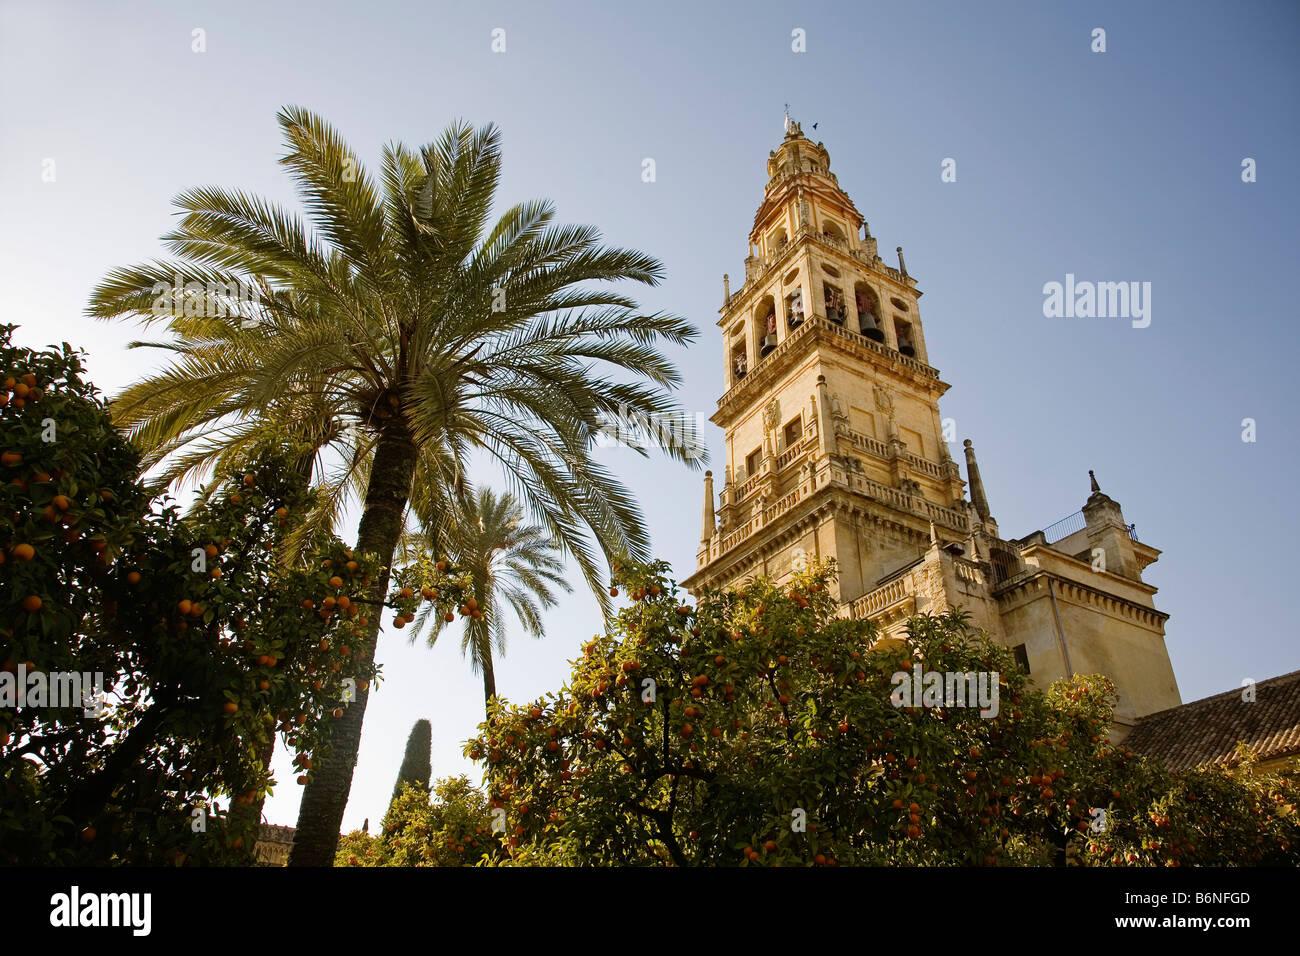 tower minaret of the mosque cathedral cordoba andalusia spain torre del alminar de la mezquita catedral y patio Stock Photo